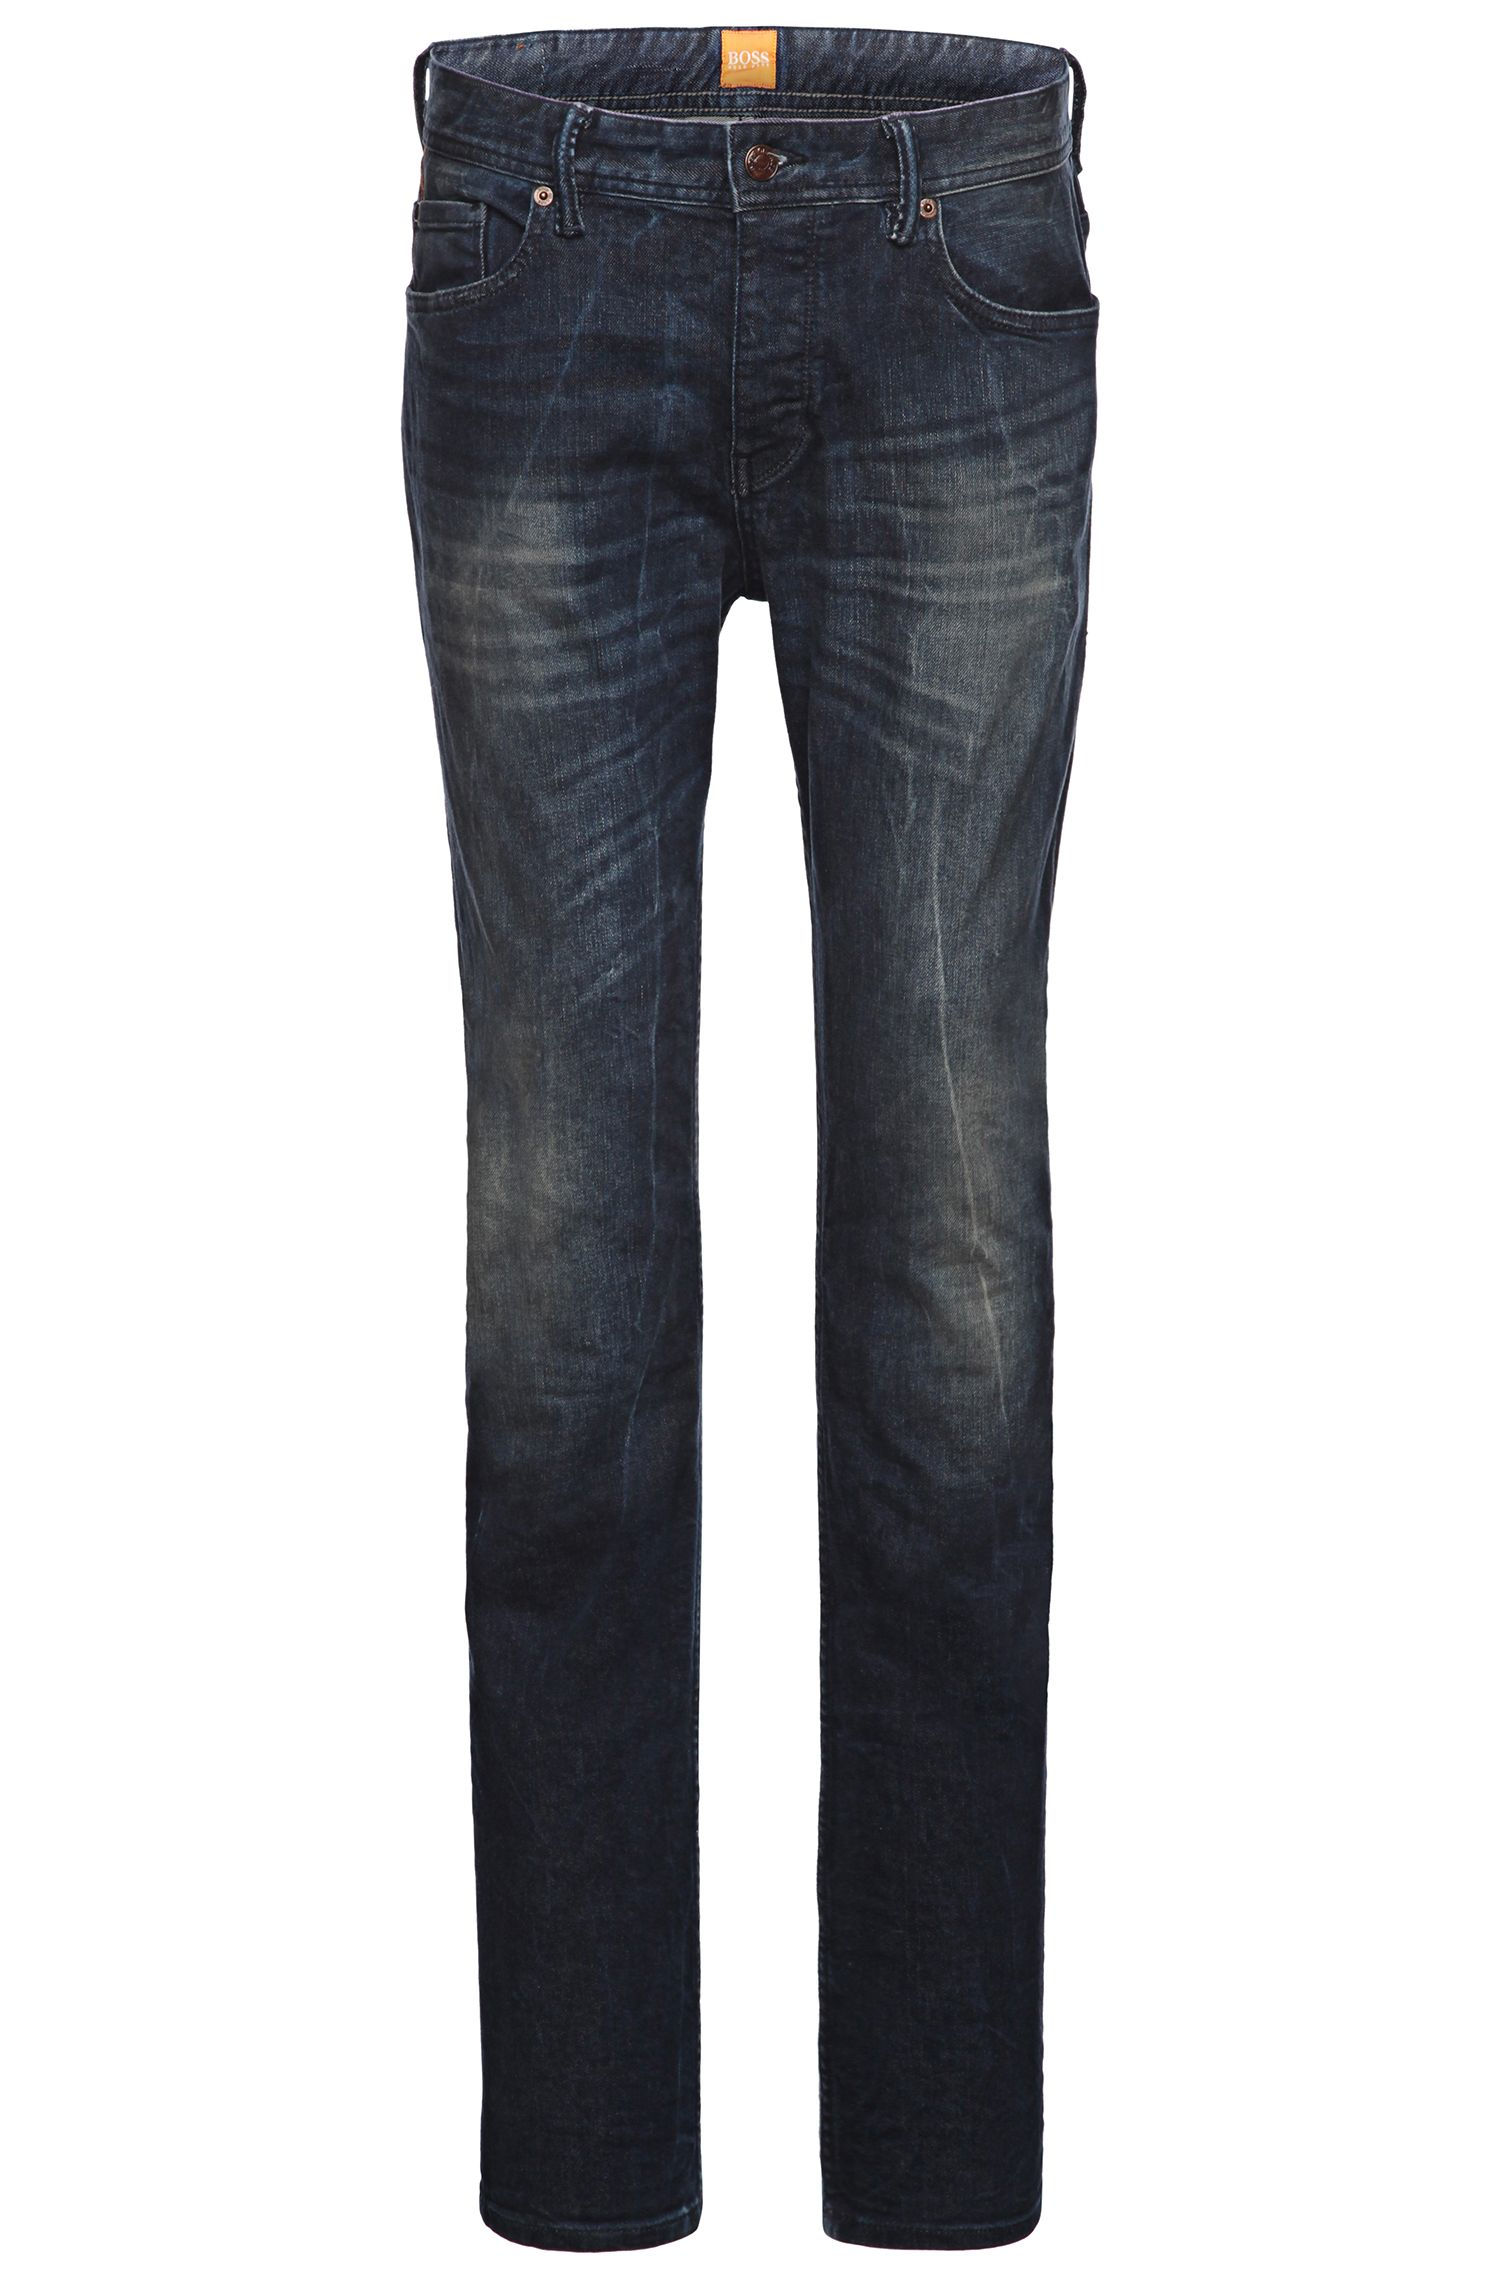 'Orange90' | Tapered Fit, 11.5 oz Stretch Cotton Blend Jeans